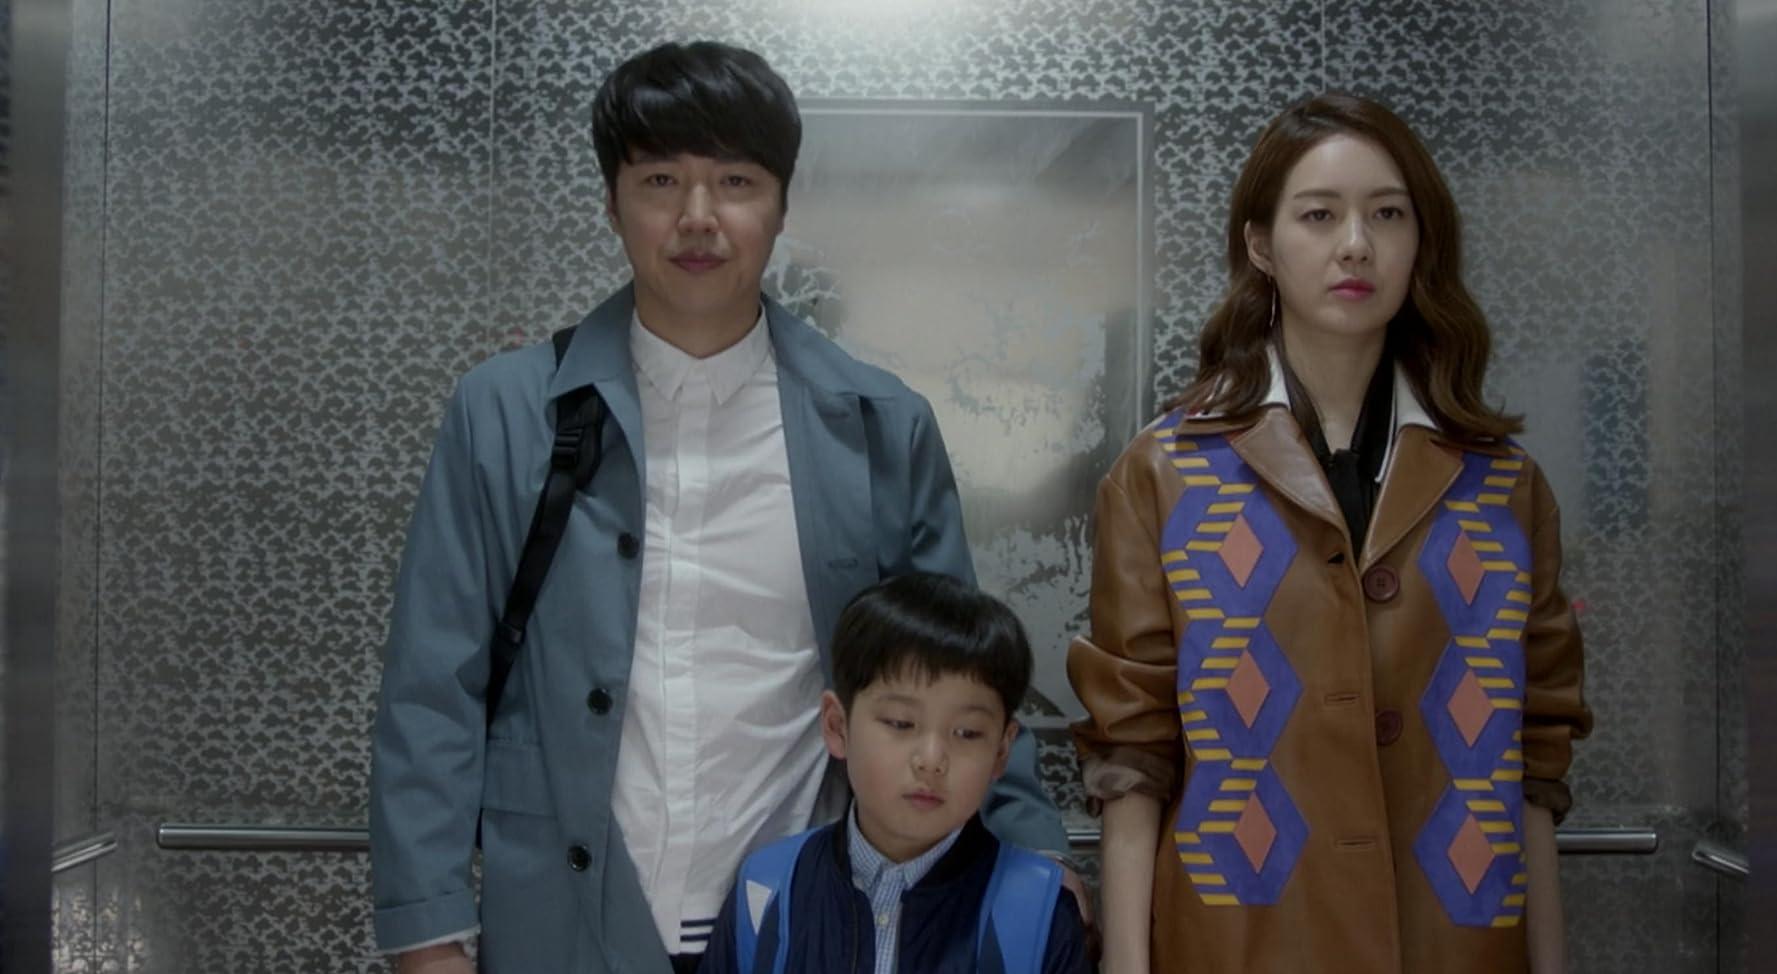 Yo-won Lee, Sang-Hyun Yoon, and Hyun-Joon Choi in Ukssi Namjeonggi (2016)